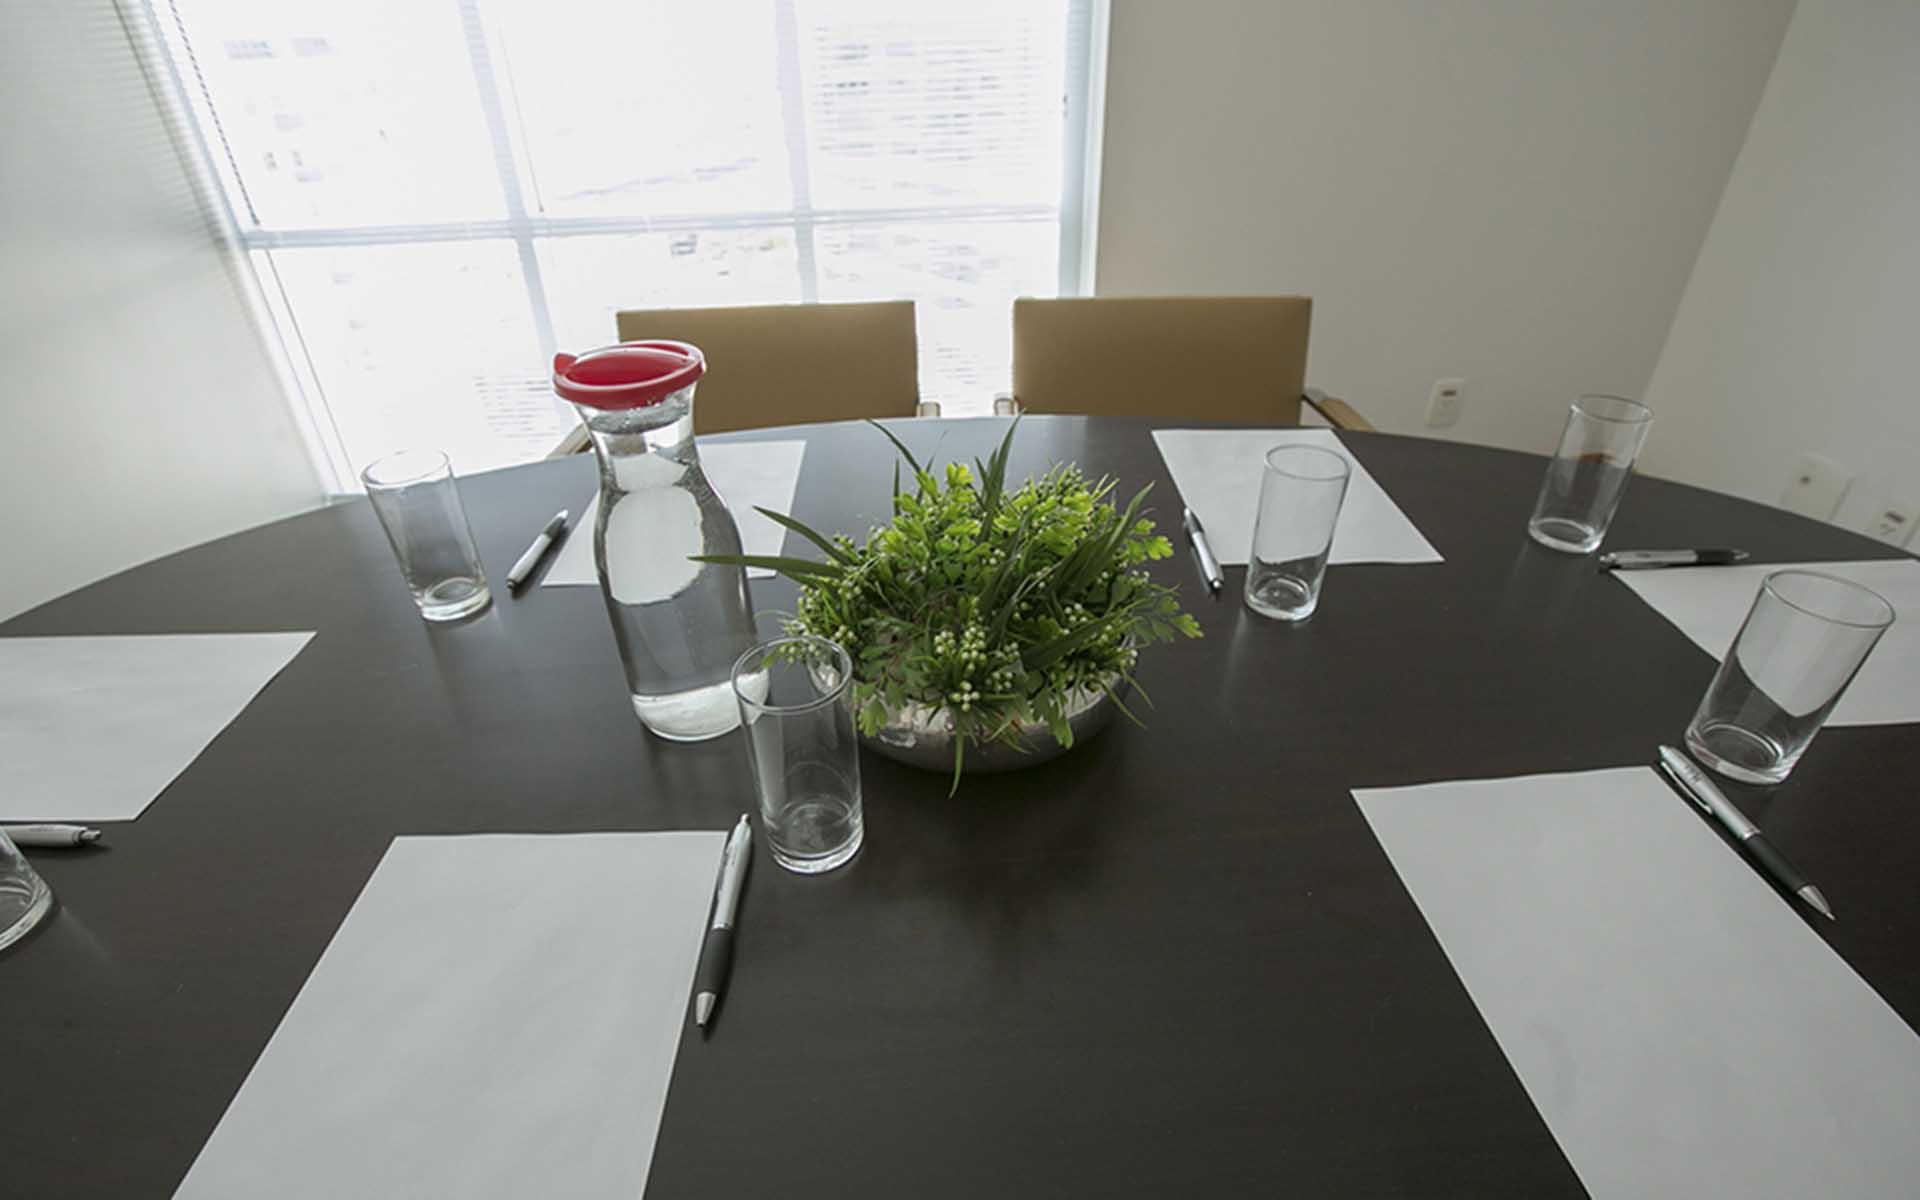 sala de reuniões do apart hotel flat em brasilia biarritz hplus long stay